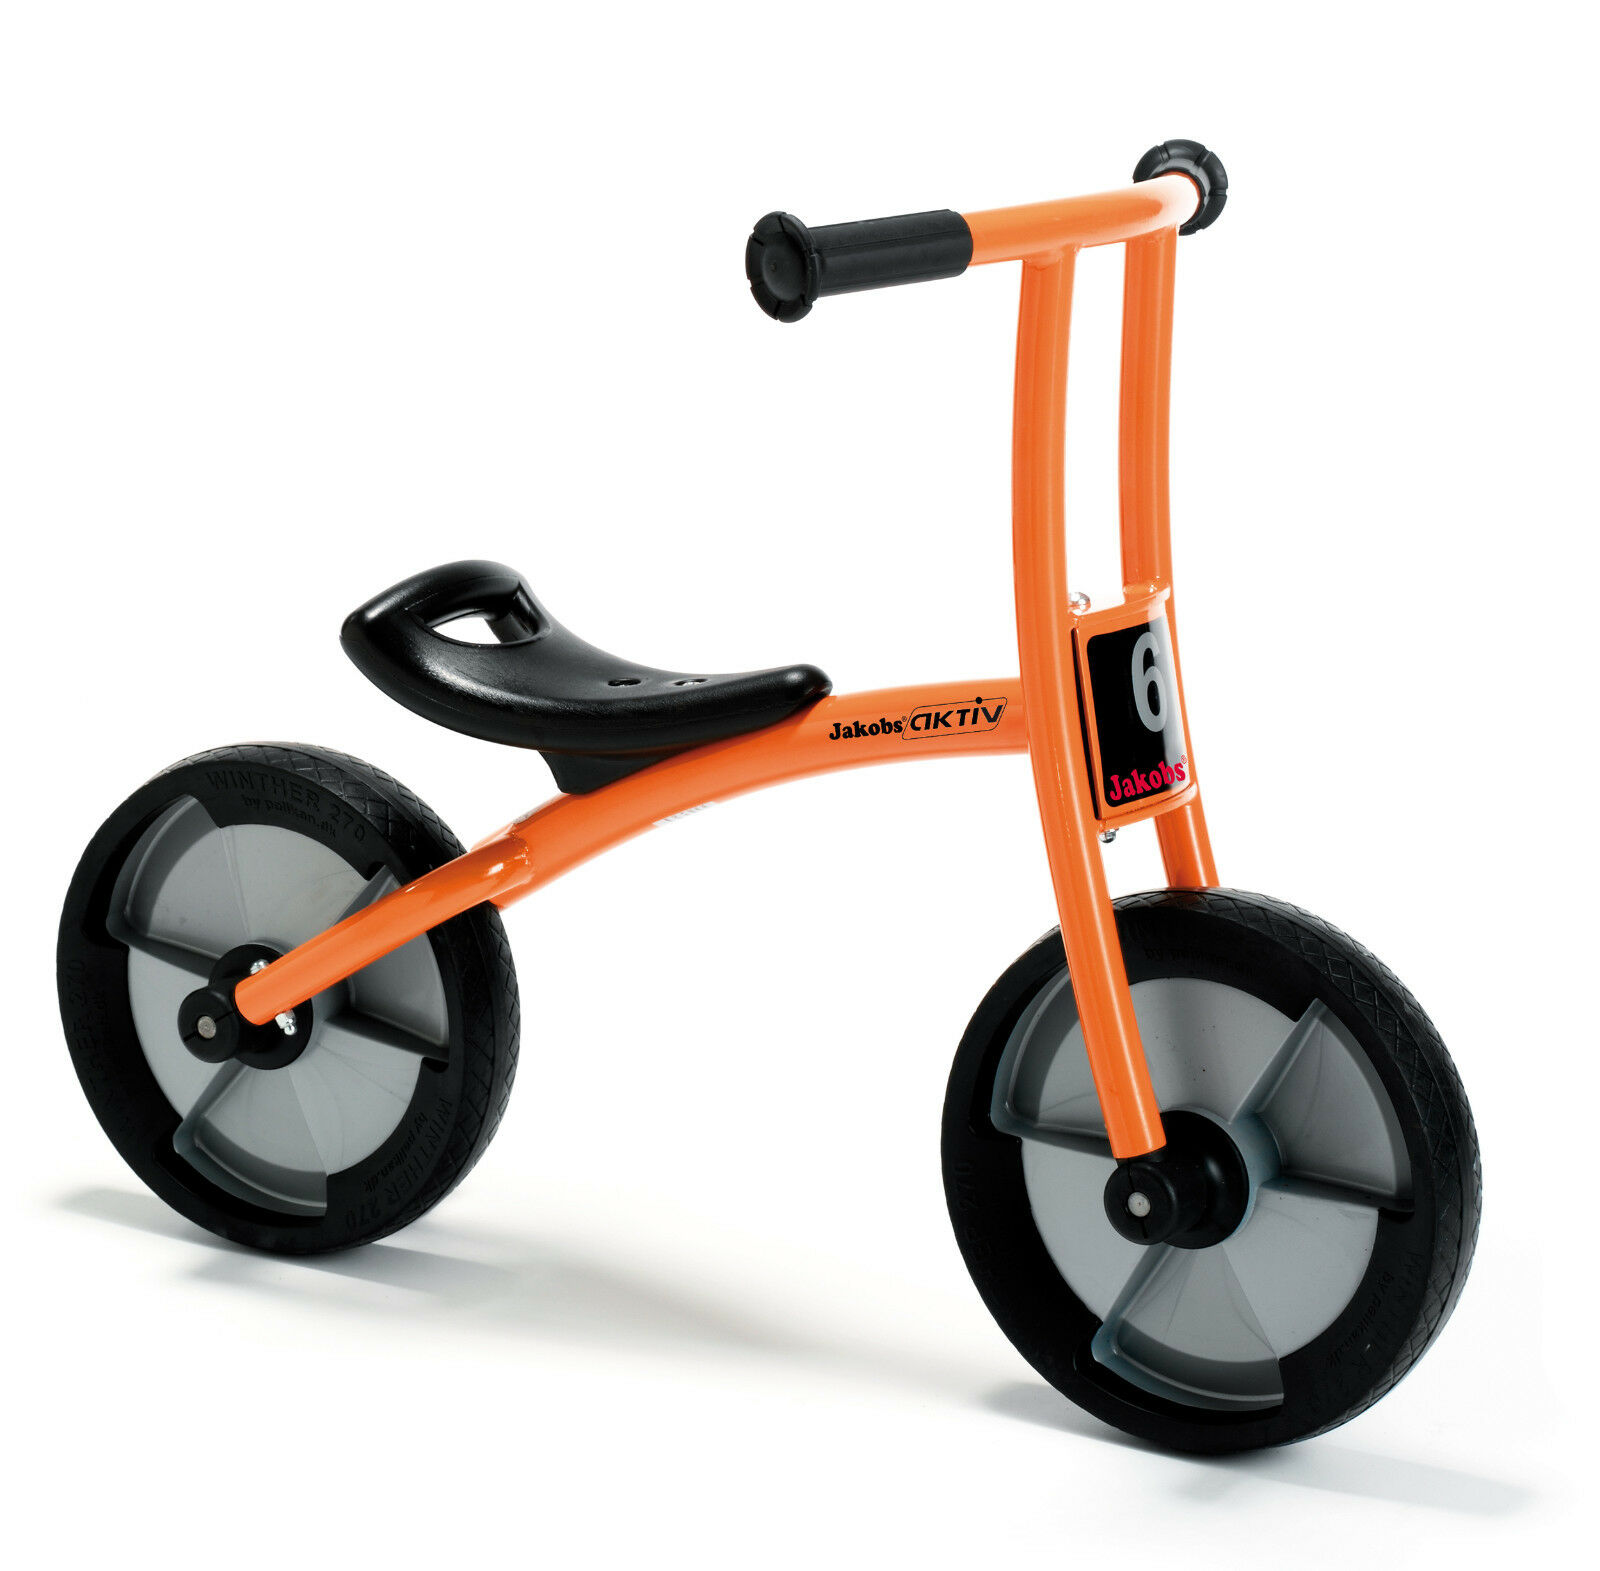 Jakobs Bicicleta Bikerunner sin Pedales Guardería Bike 3 hasta 6 Años Kita